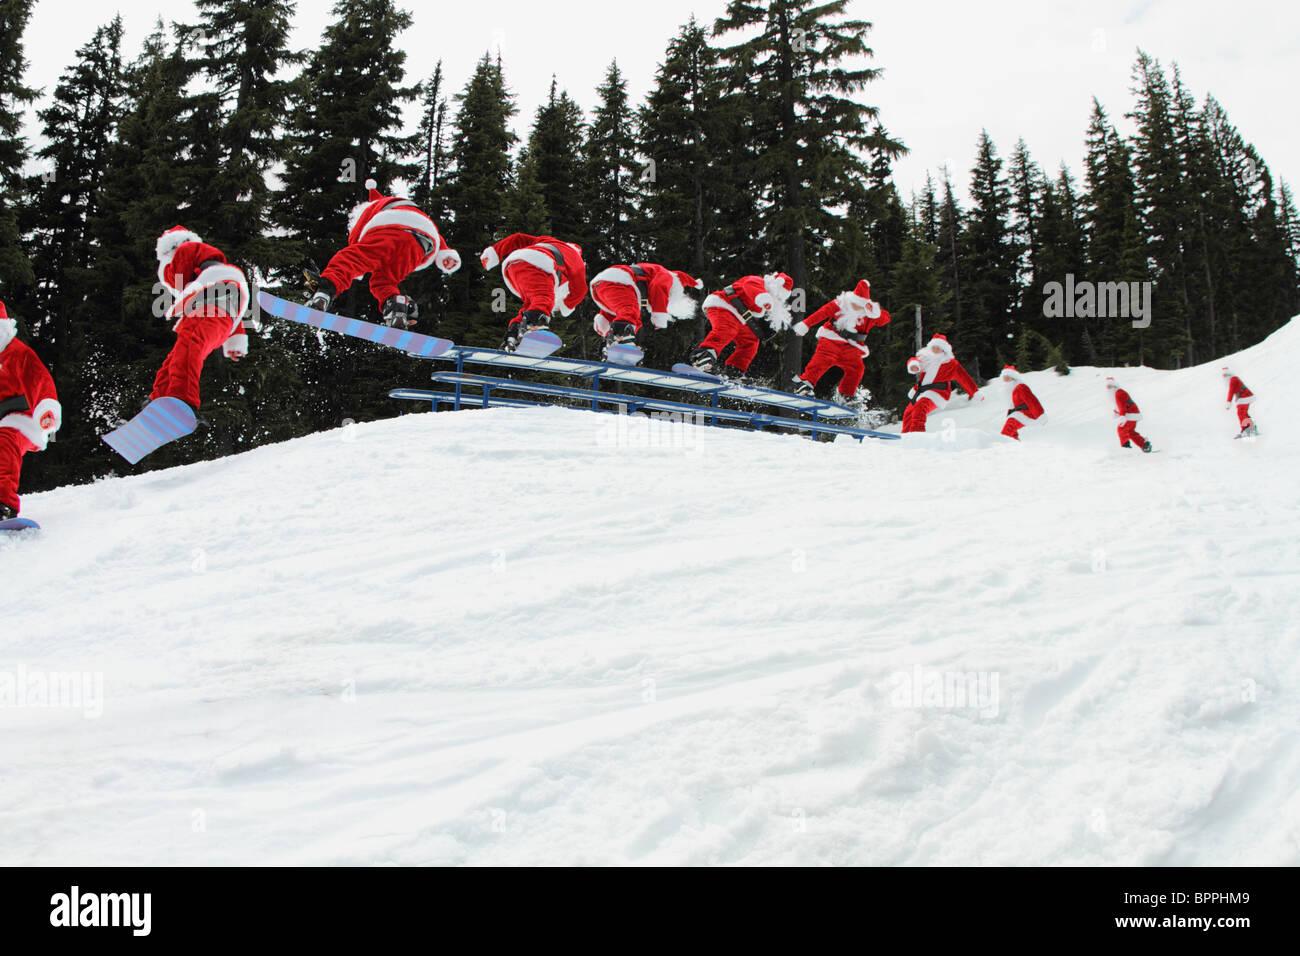 Santa claus snowboarding sequence - Stock Image